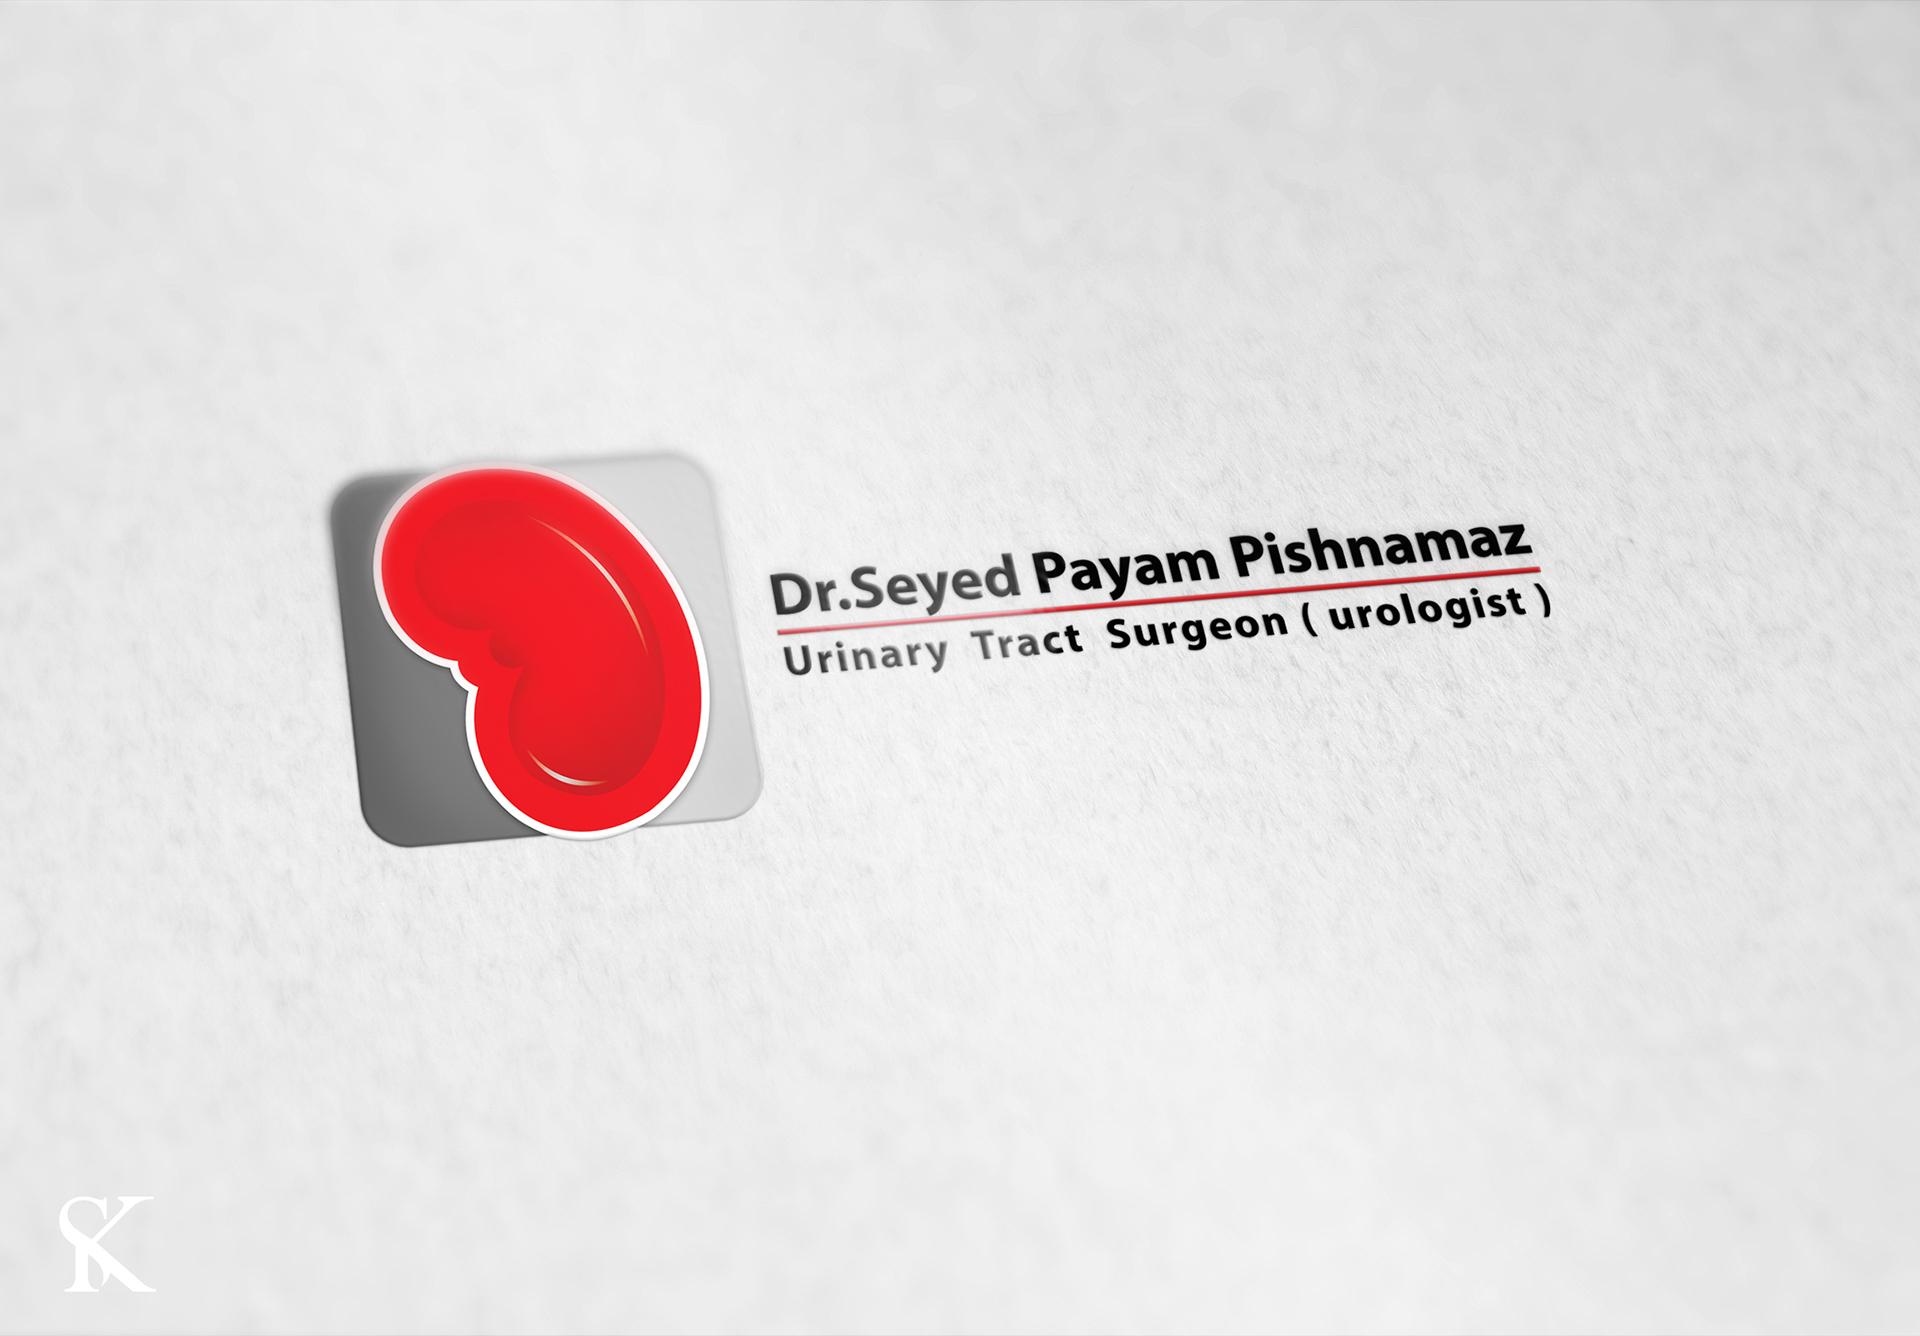 Urinary Tract Surgeon Logo Design 2013 On Behance